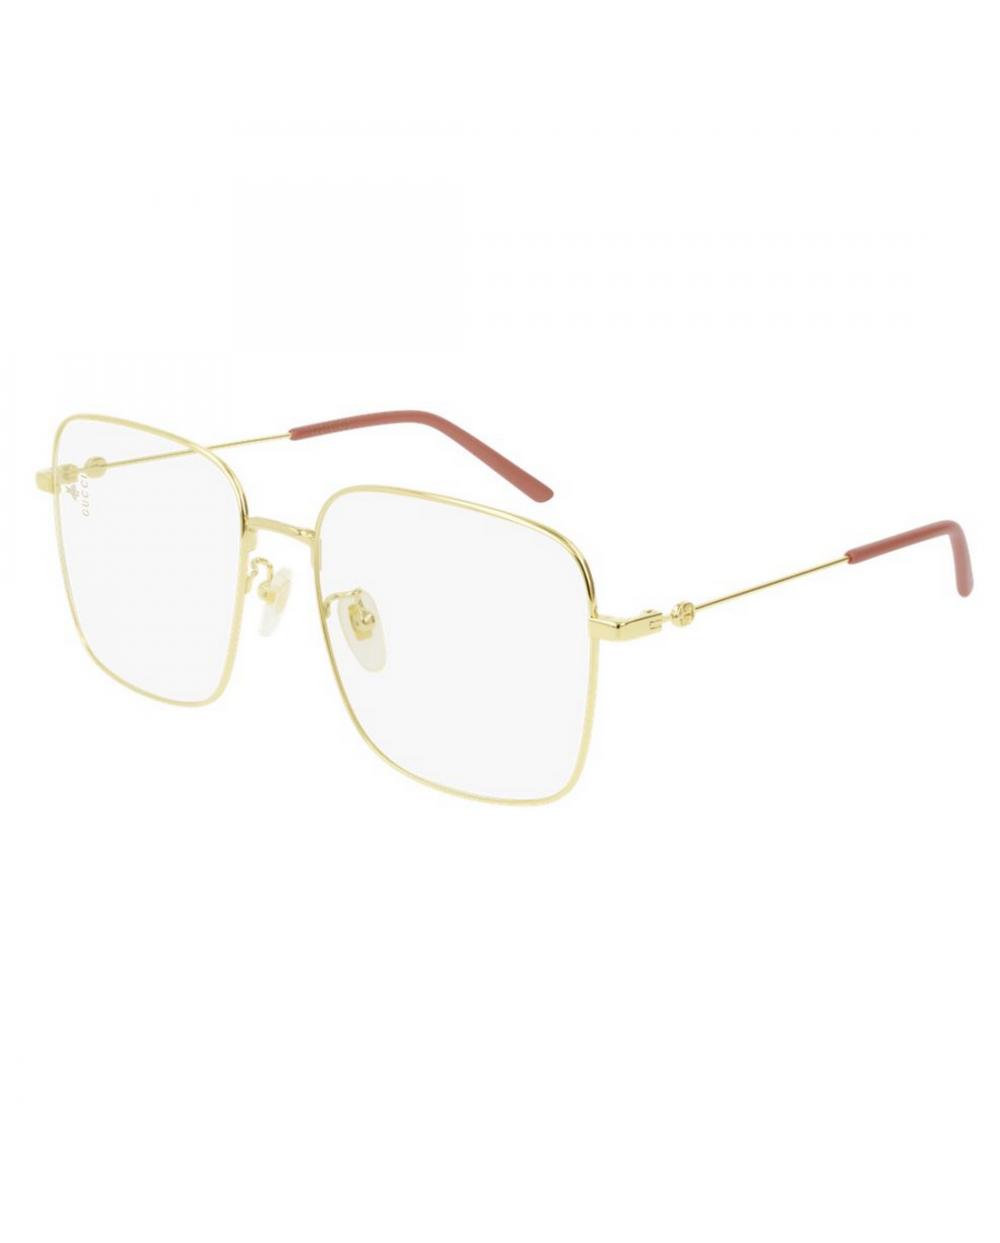 Glasses eyeglasses Gucci GG 0445O original packaging warranty italy